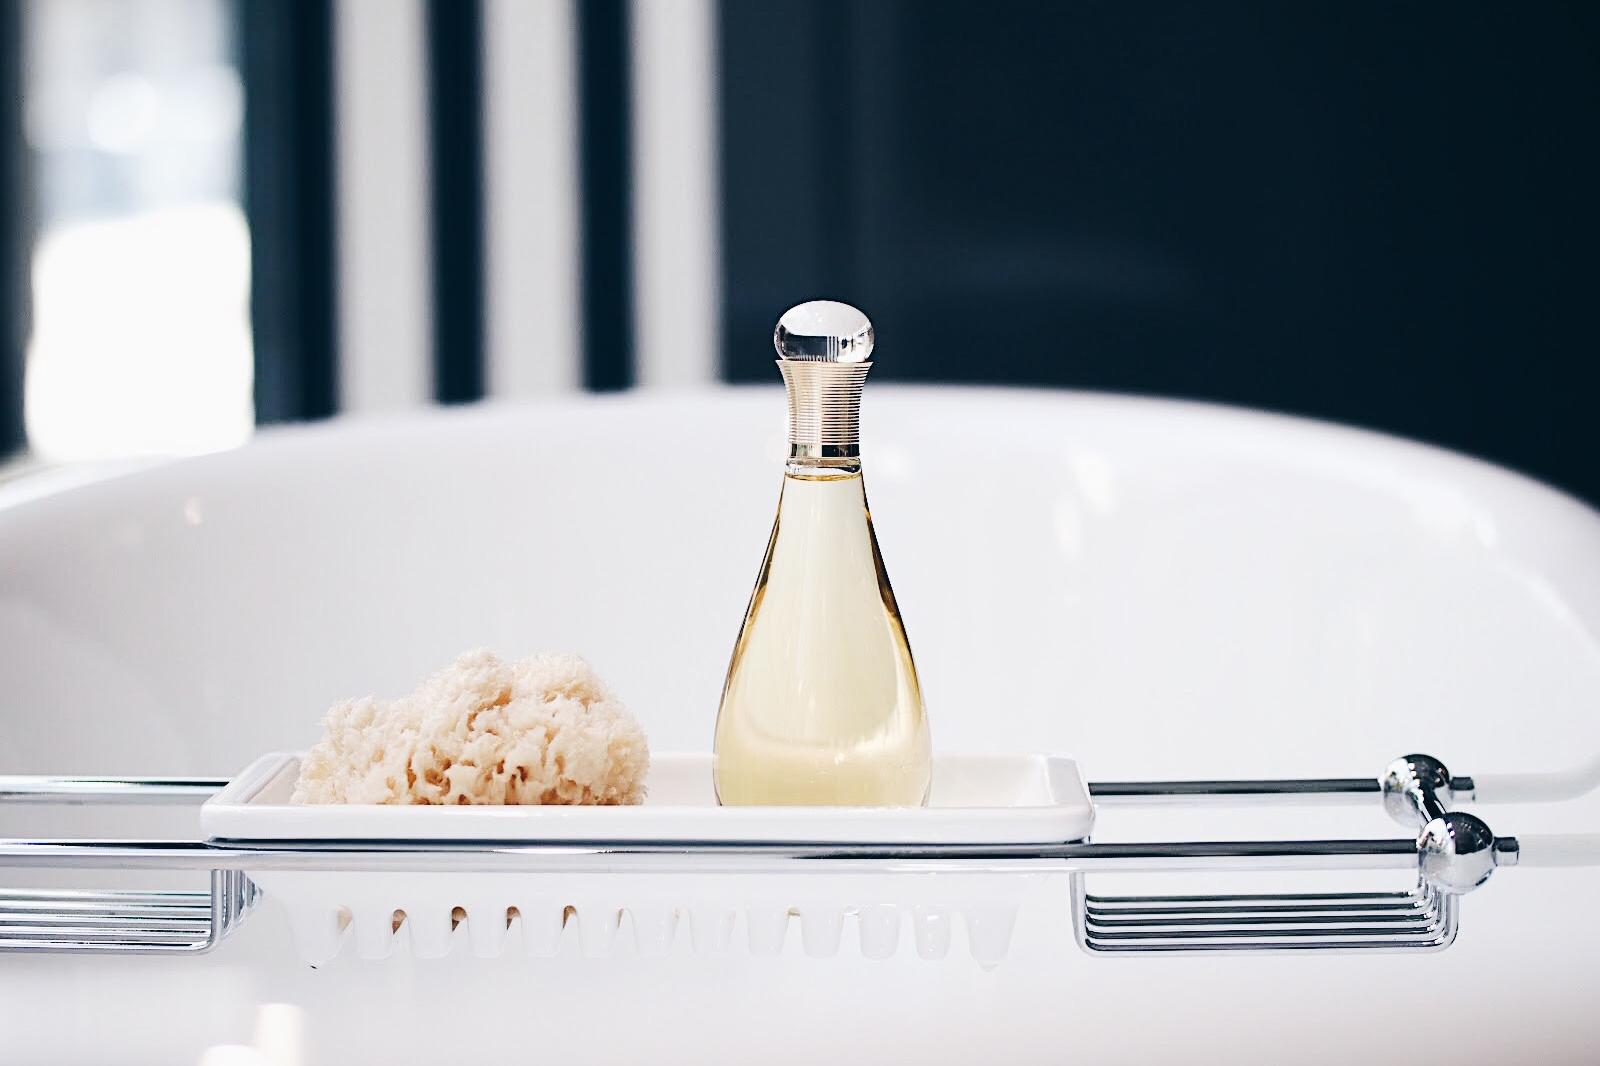 dior j'adore huile de bain avis test